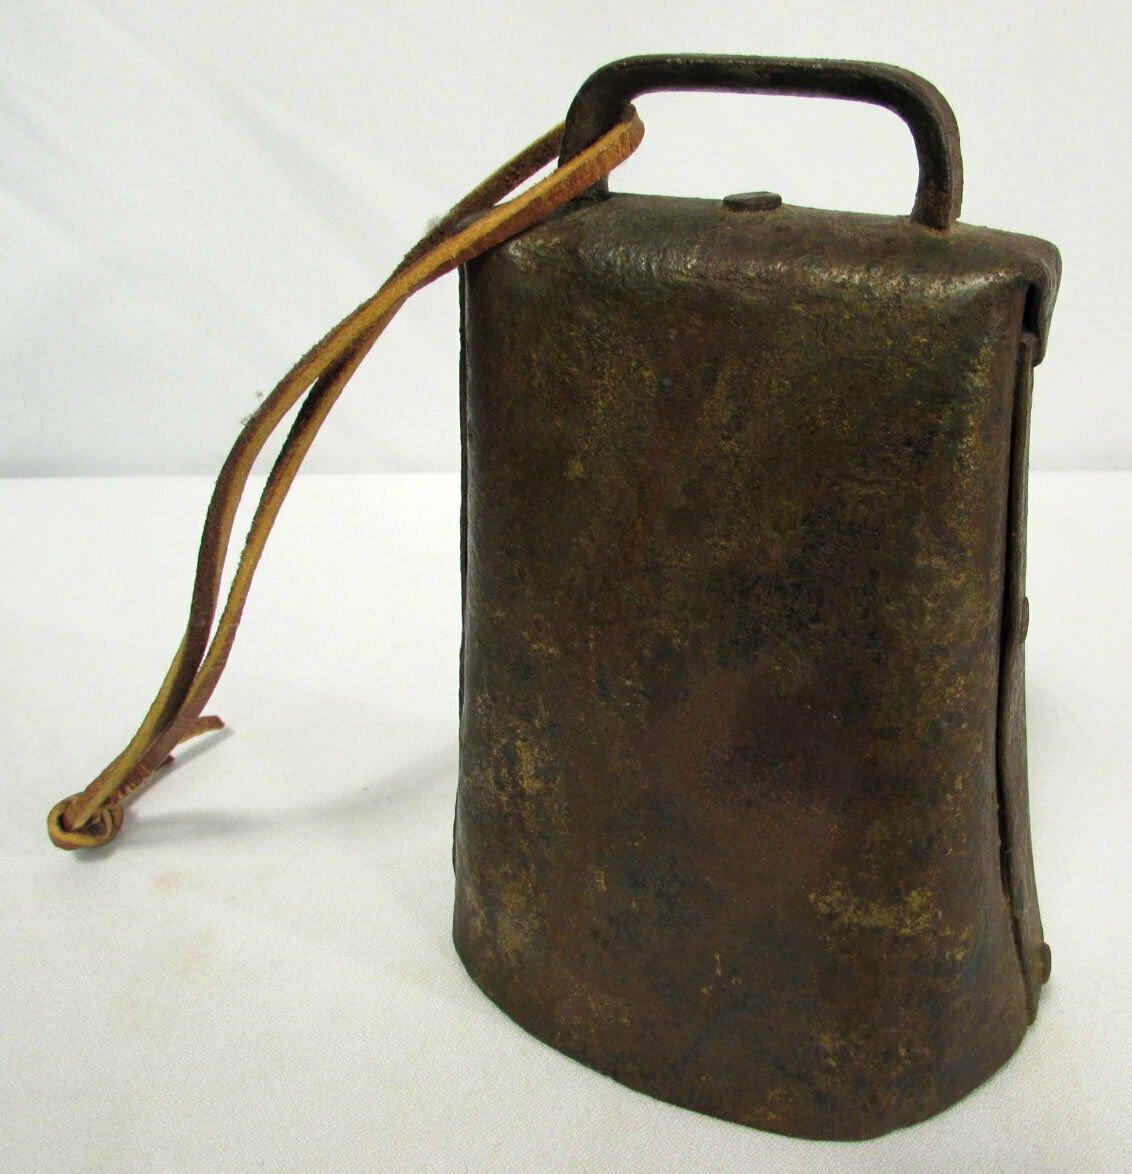 "Antique Primitive Cow Bell Farm Livestock Iron Folded Metal Orig Clapper 6 1/4"""